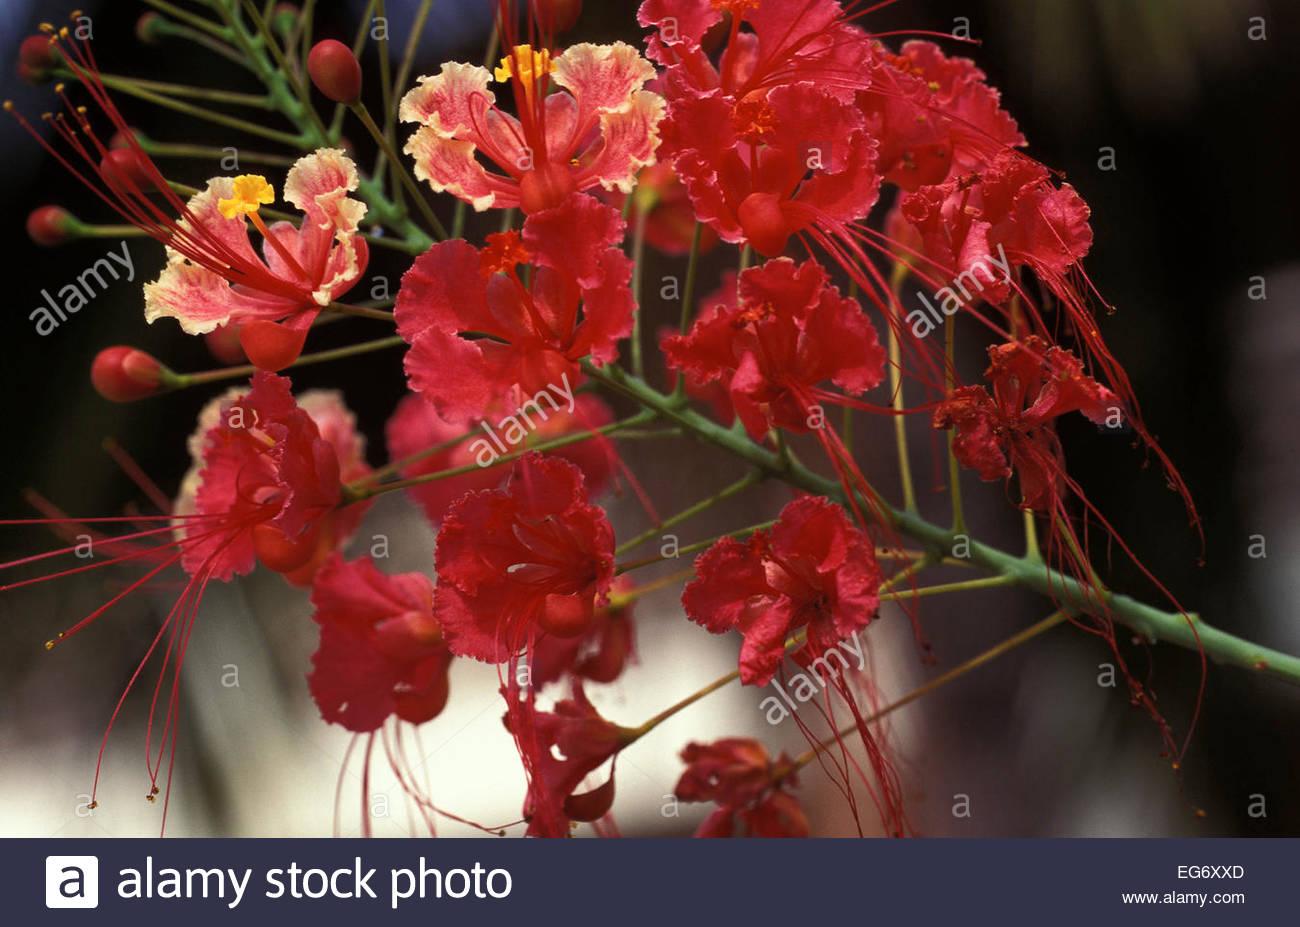 Flamboyant flower, Tahiti, French Polynesia - Stock Image